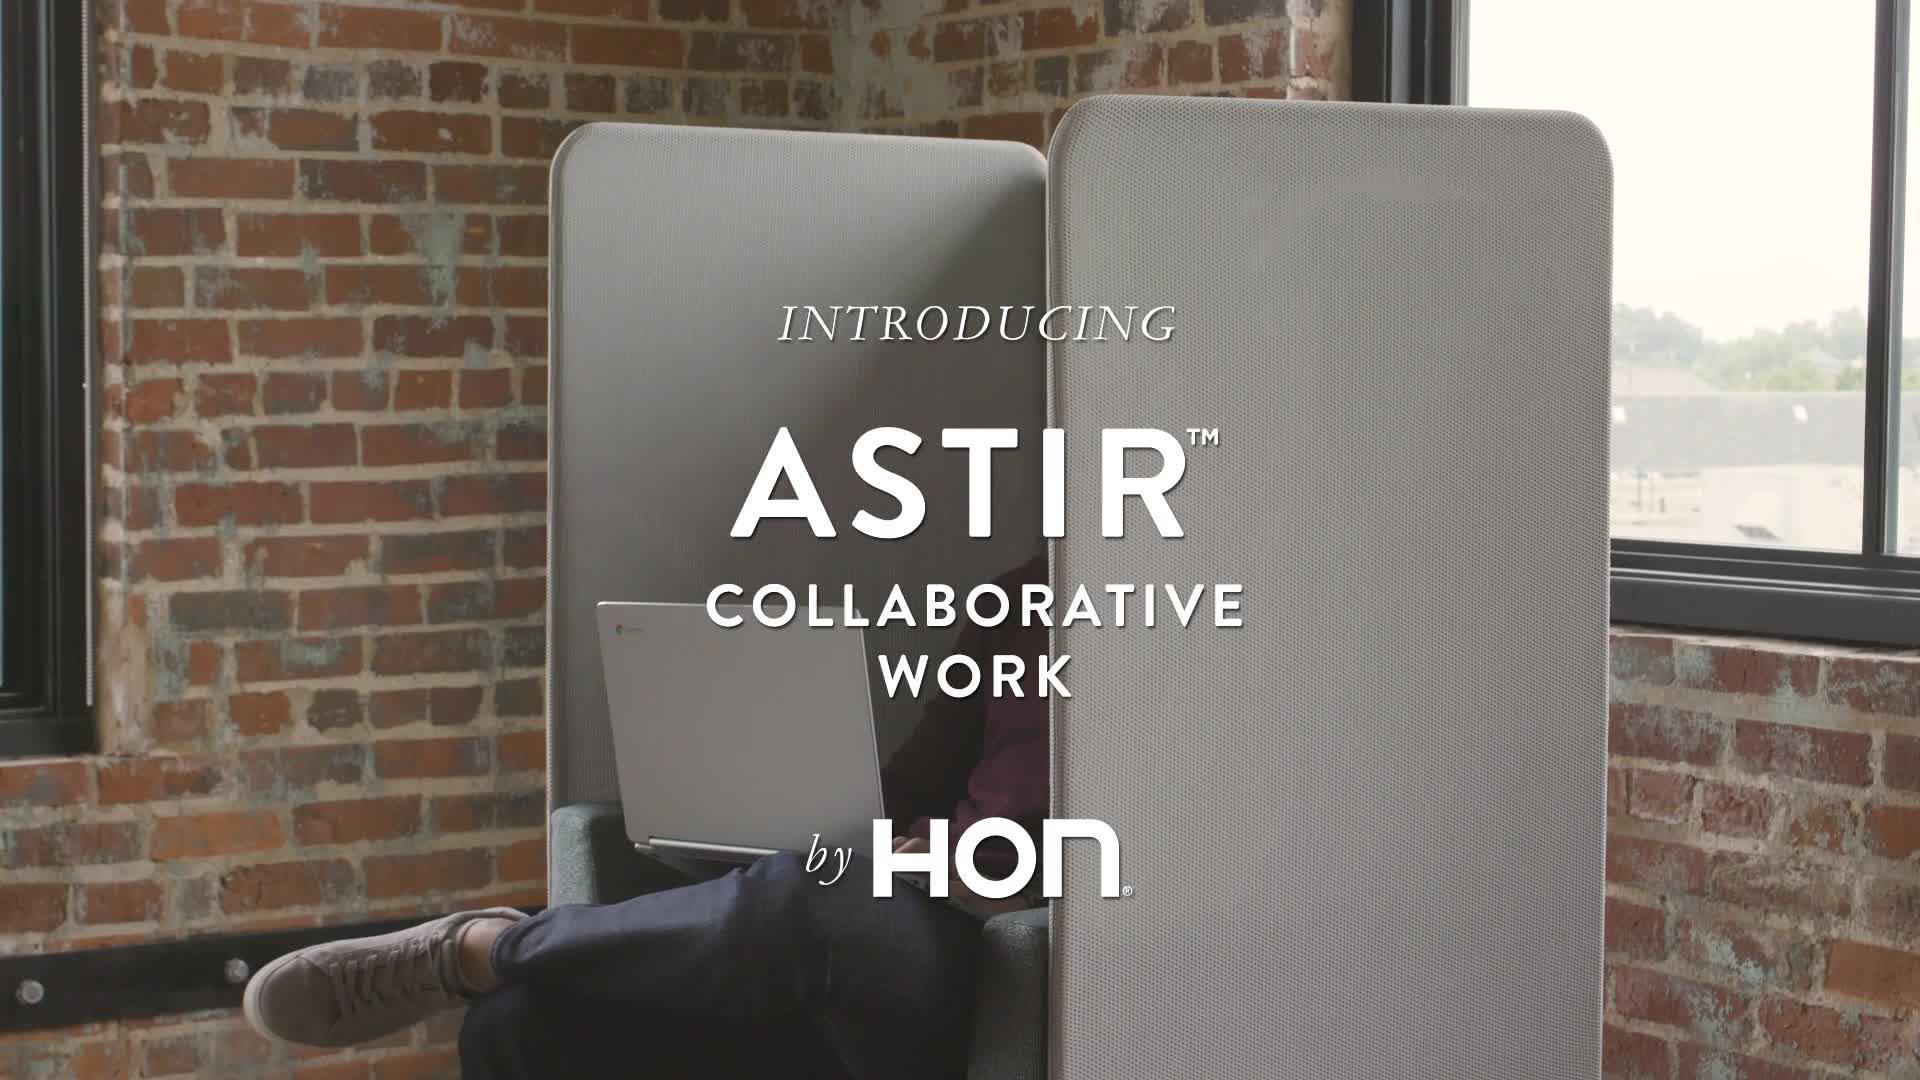 Introducing Astir Video video link